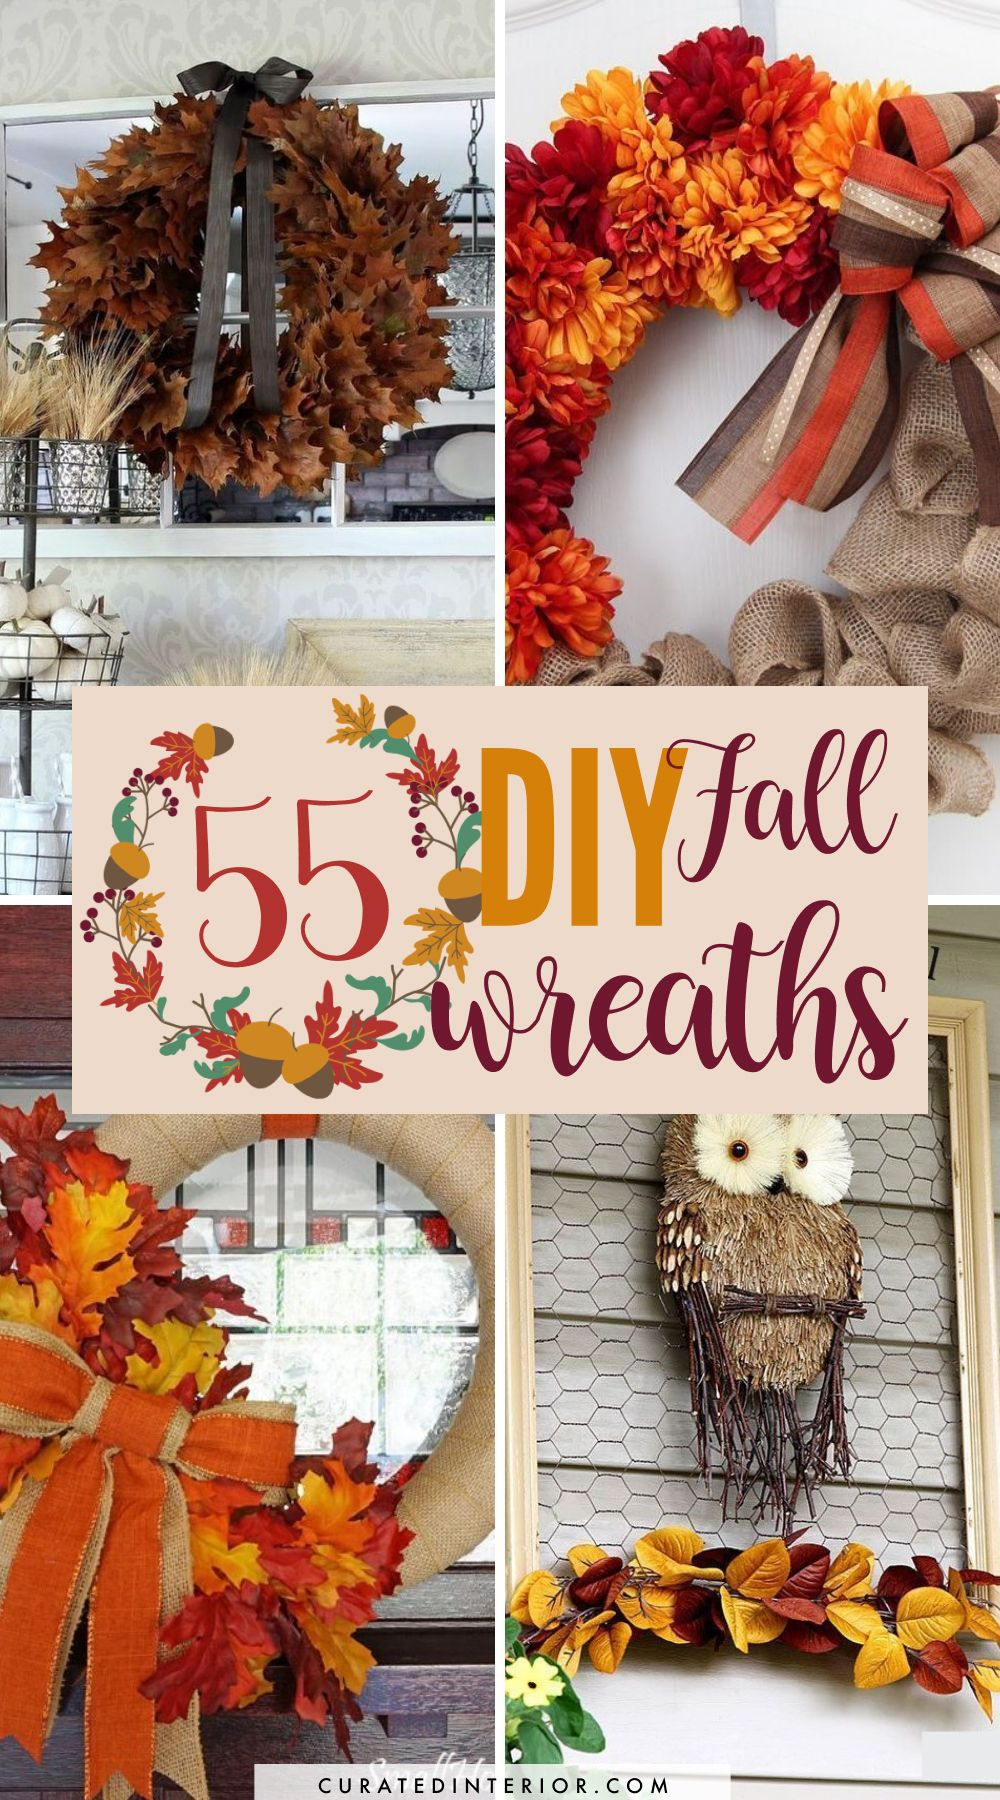 55 DIY Fall Wreaths to Make this Autumn!